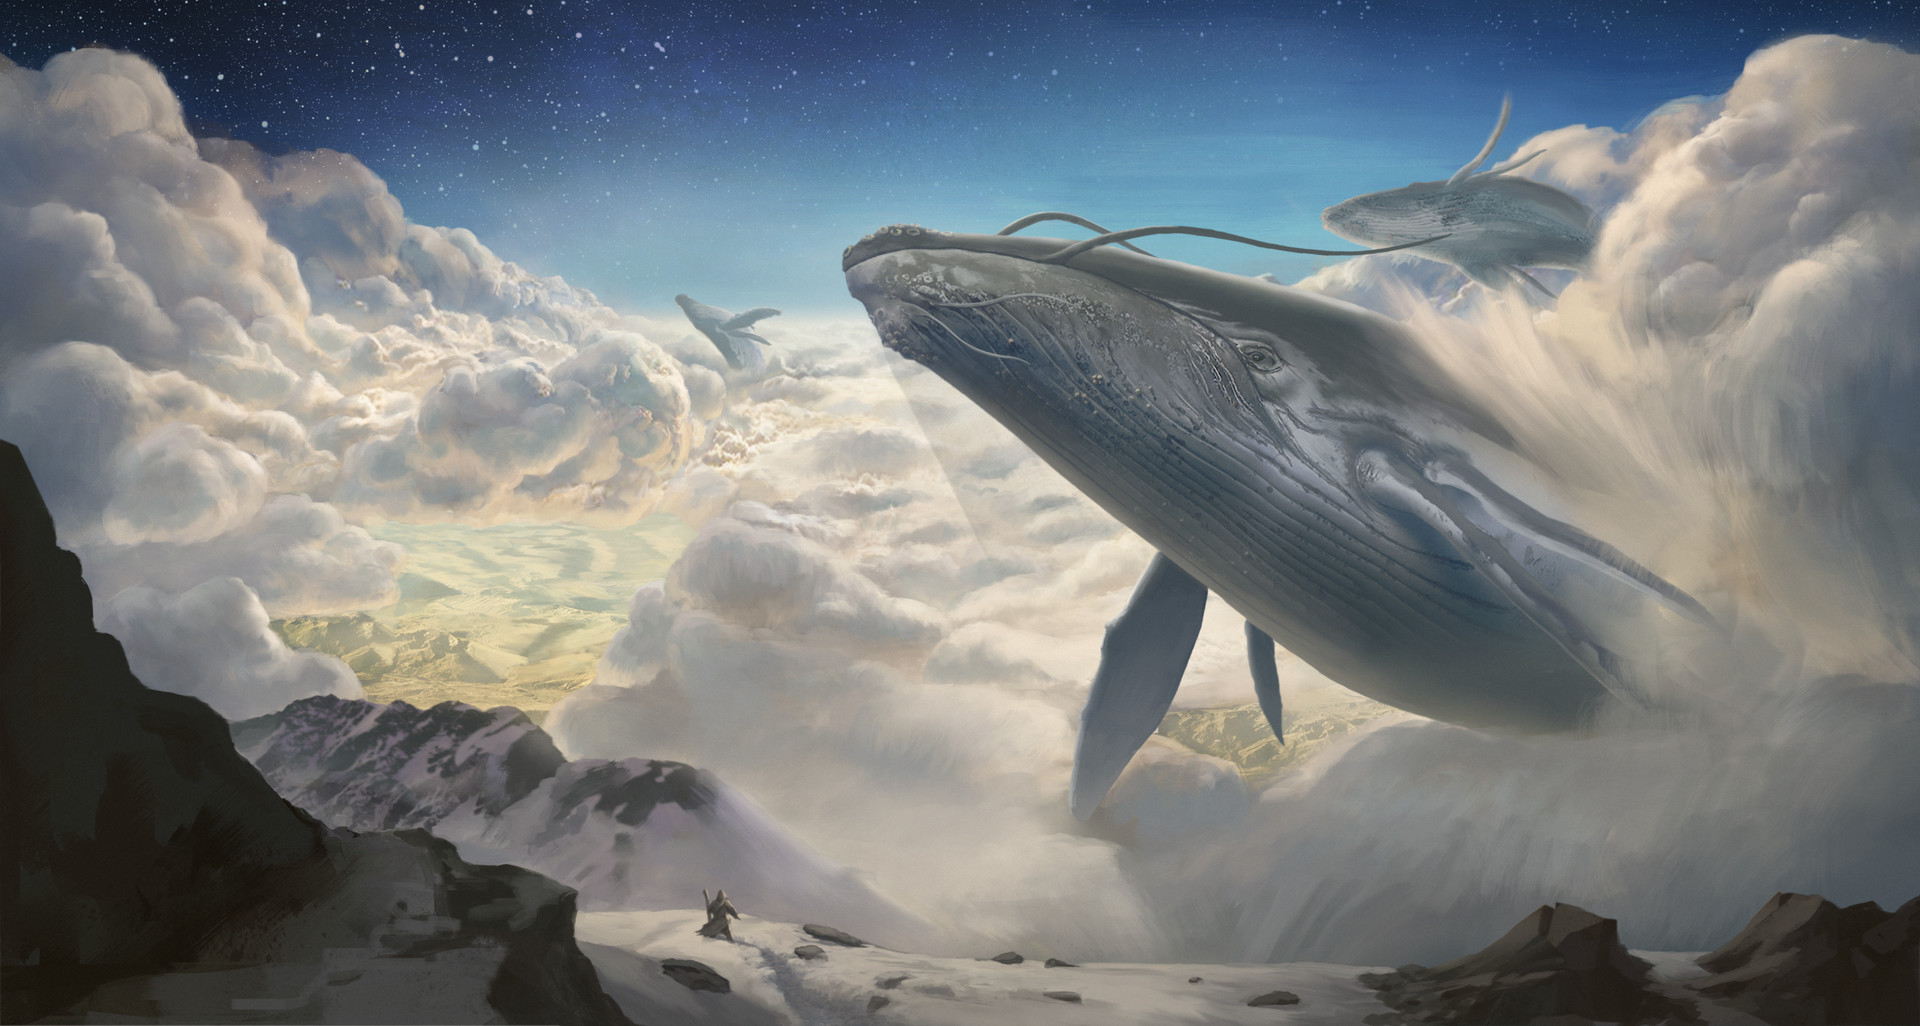 Imaginary Wallpapers Hd Flying Whales By Sampo Jumisko Imaginaryleviathans